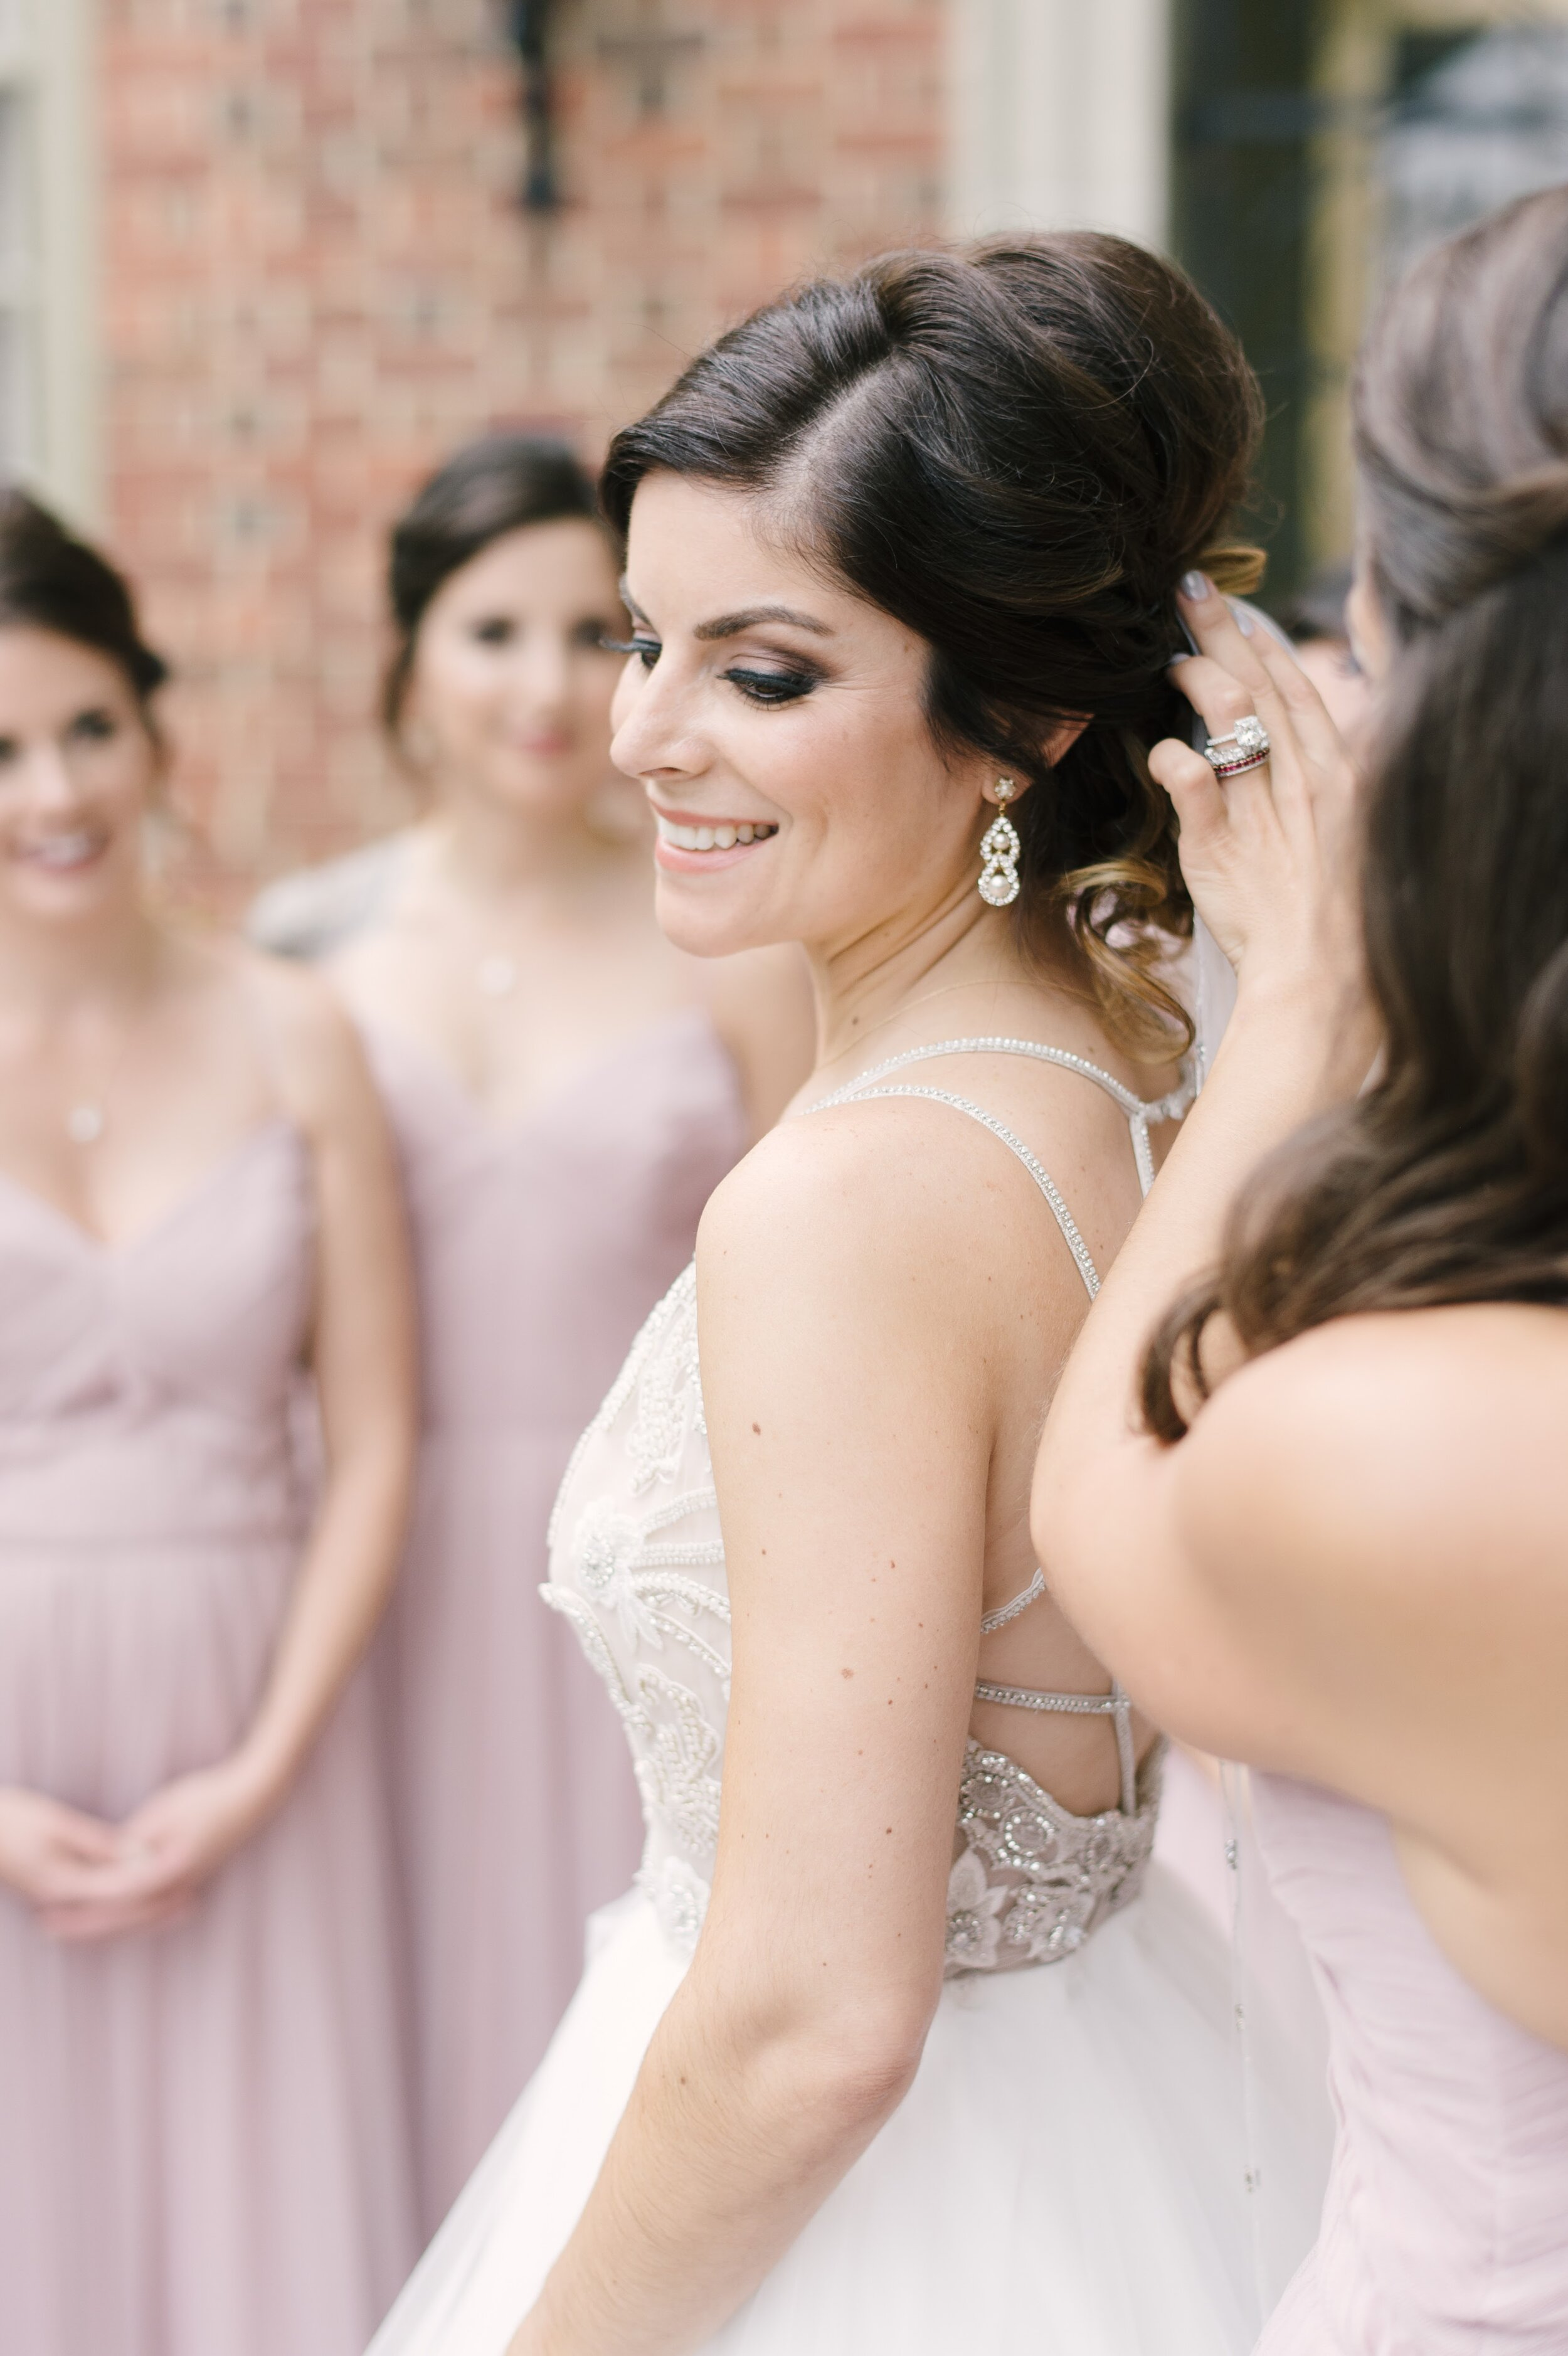 gettingready-wedding-sarah-street-photography-188.jpg